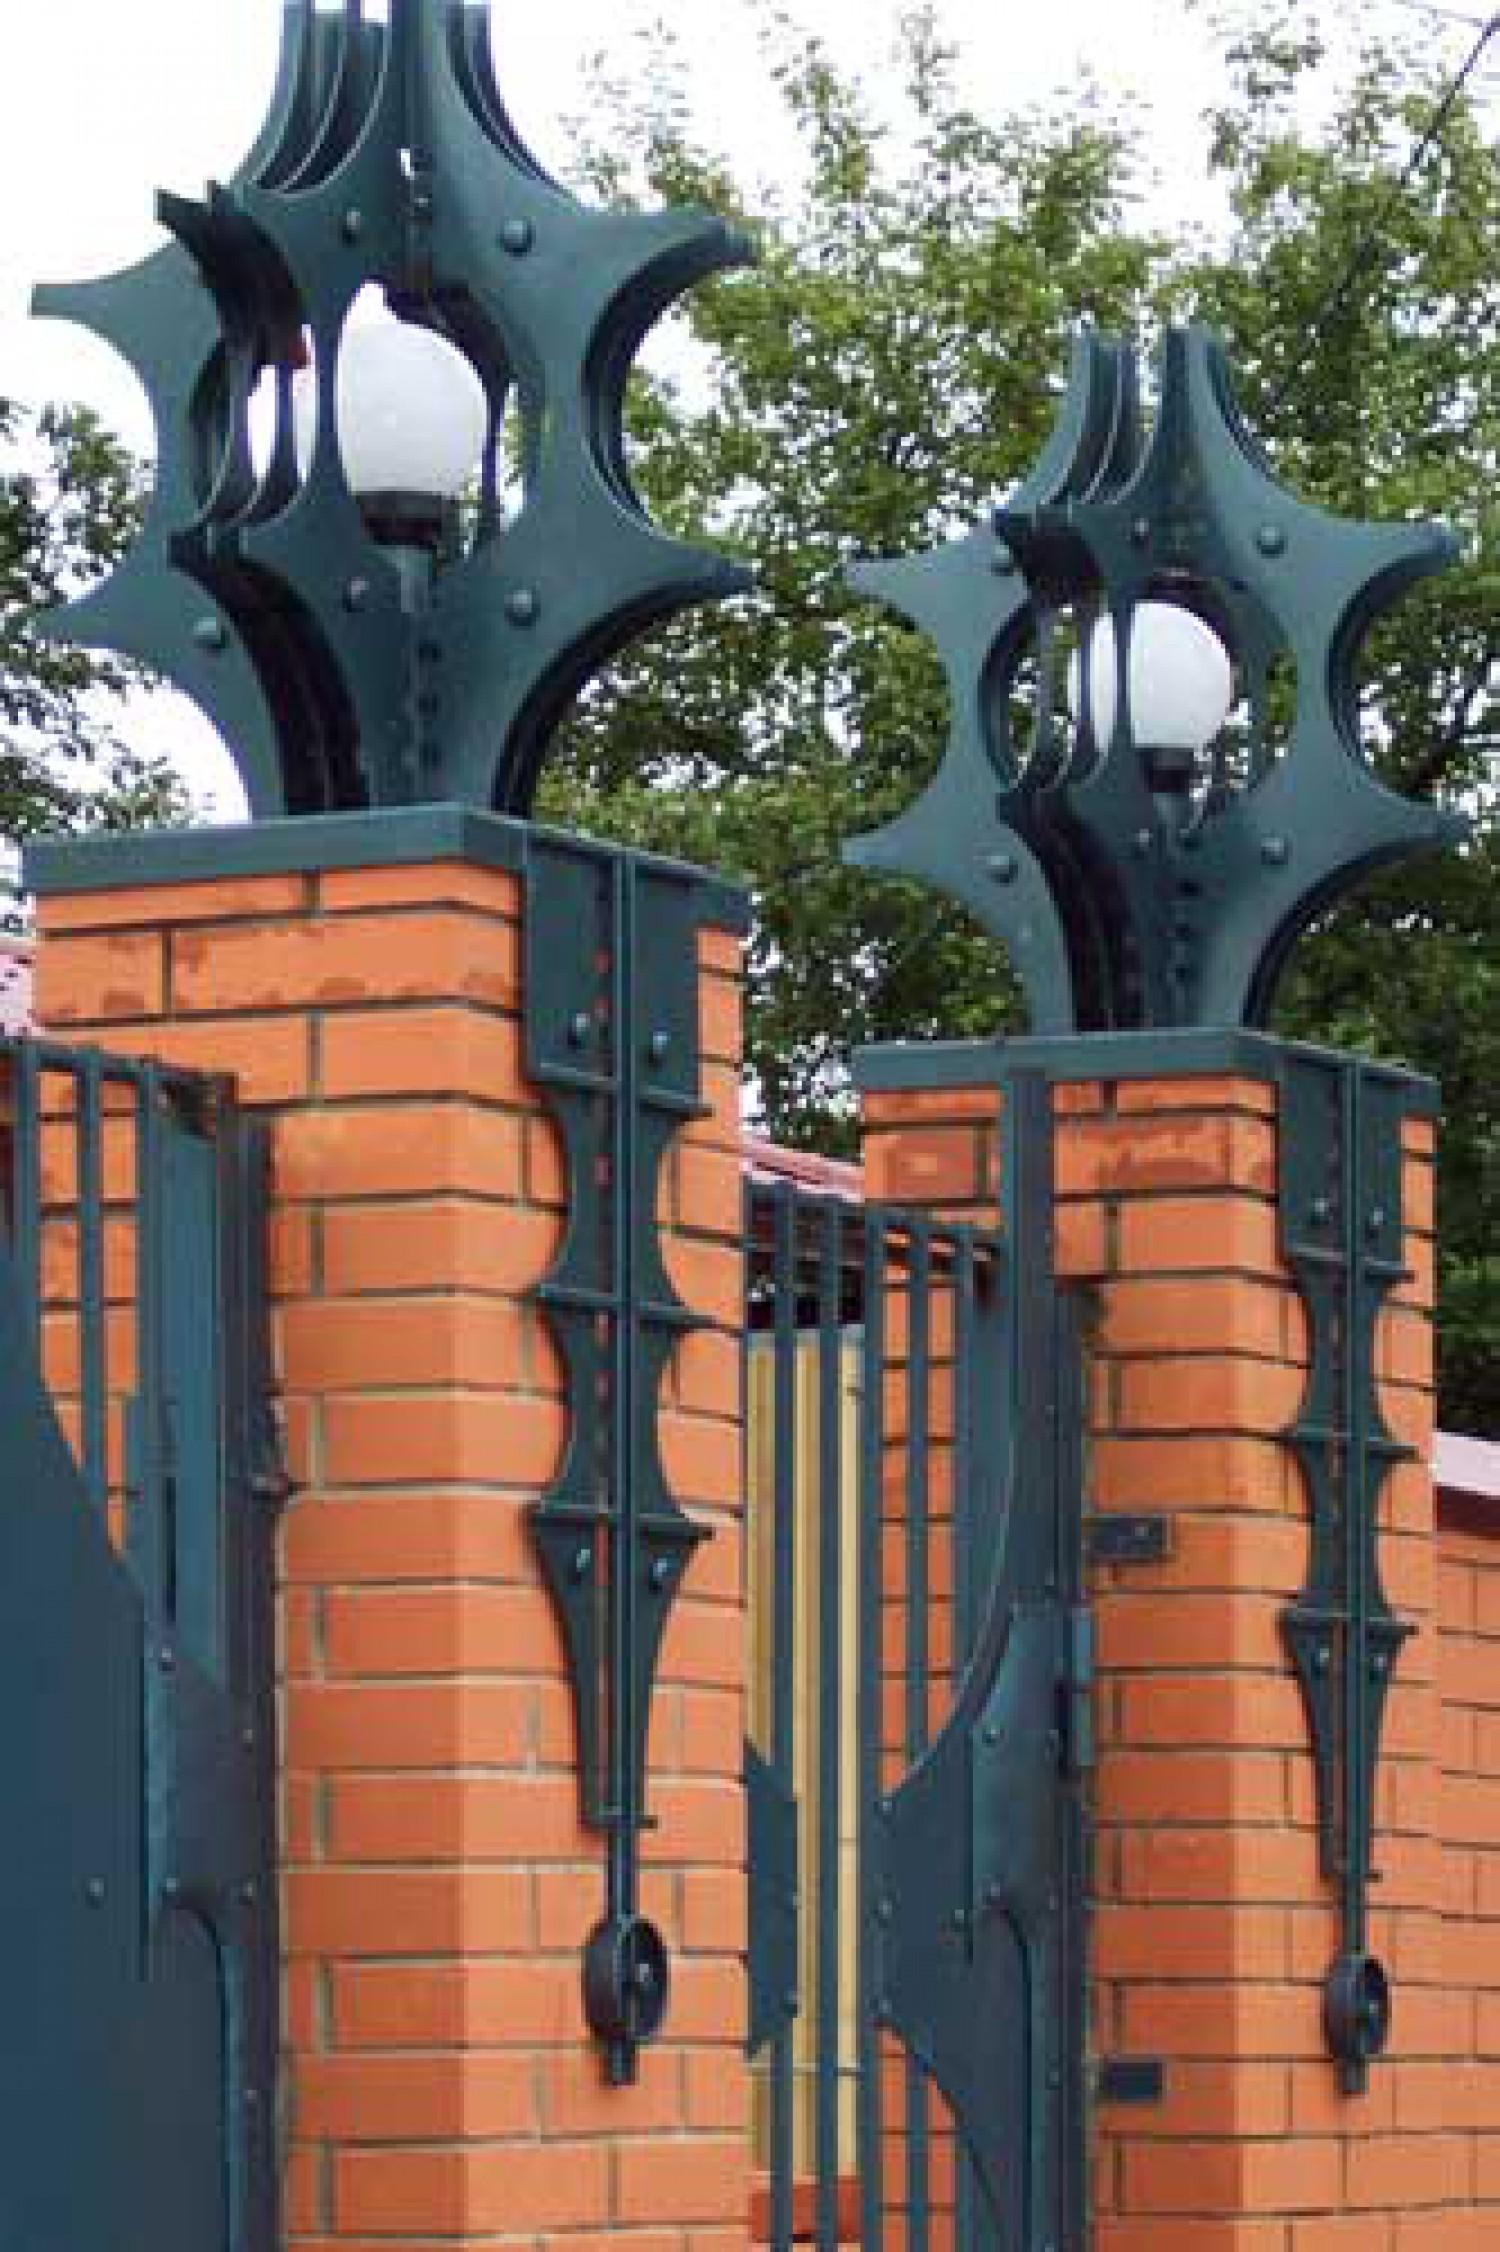 В.Ф.Ковалёв. Ворота с фонарями. 2004. Металл, ковка.